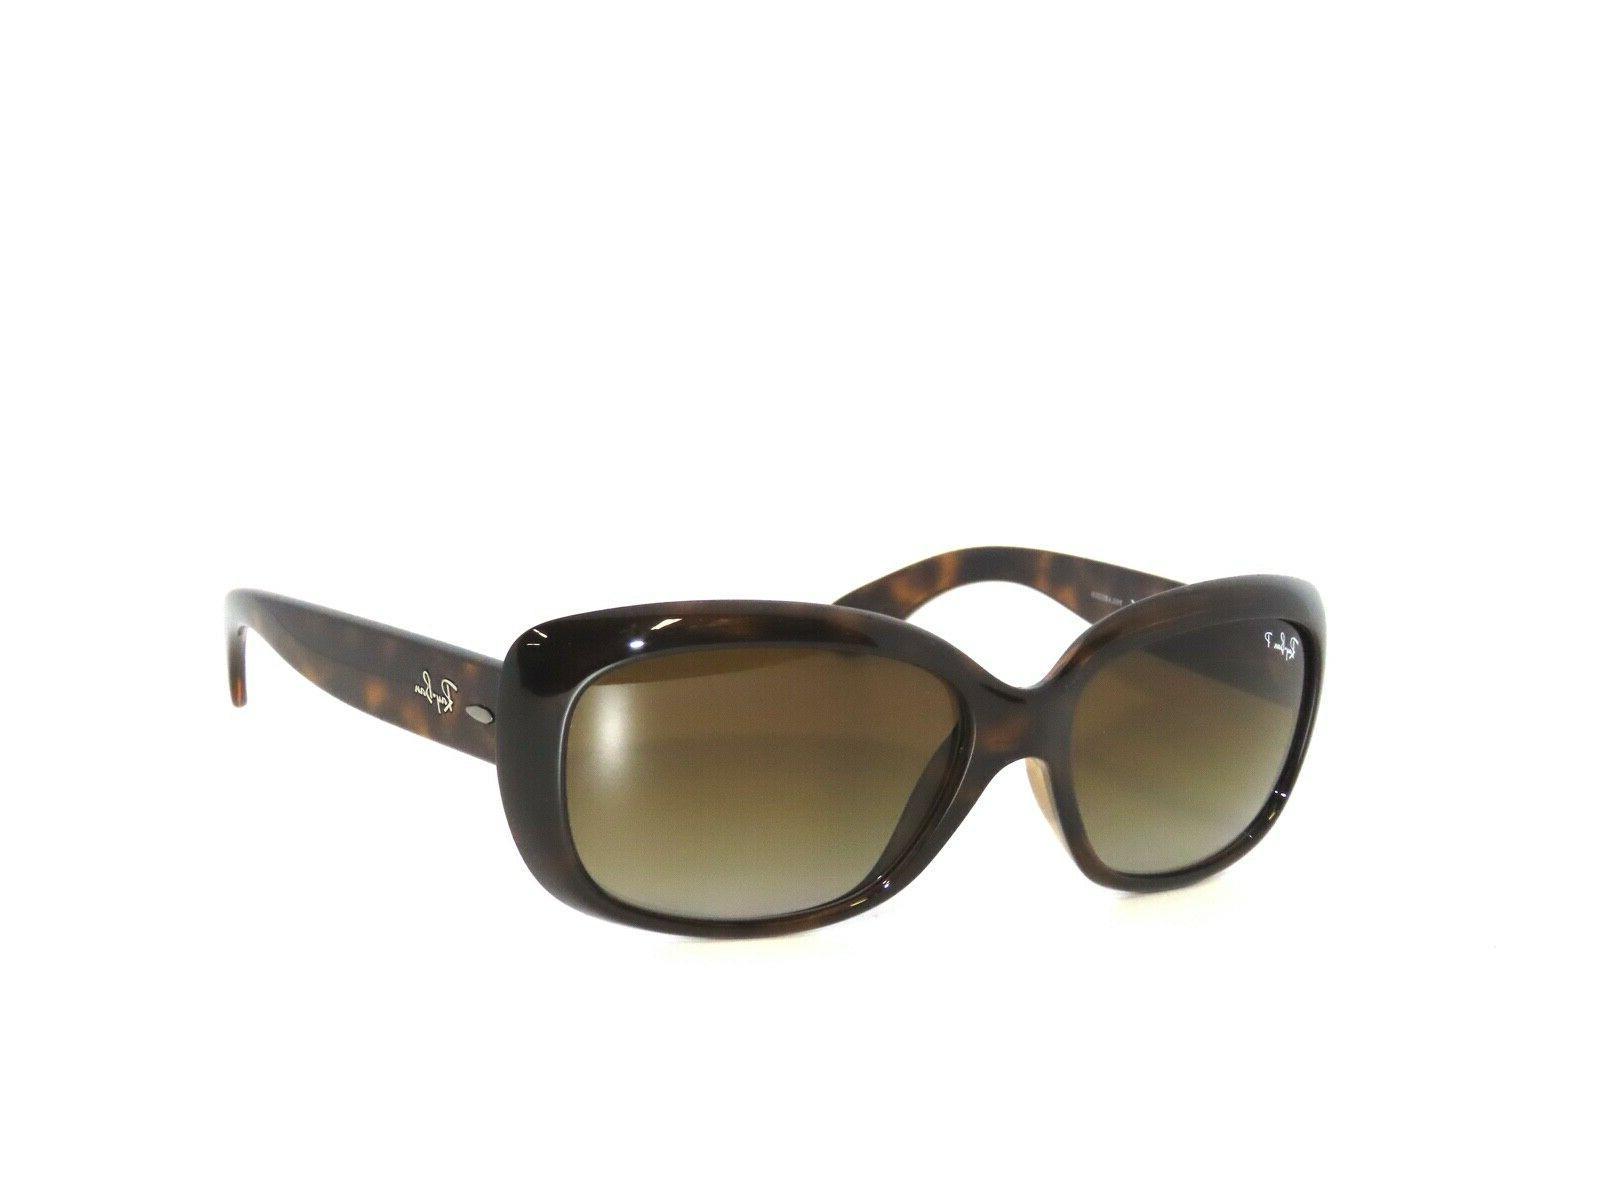 Ray-Ban Jackie Ohh RB 4101 710/T5 Light Havana Sunglasses Br